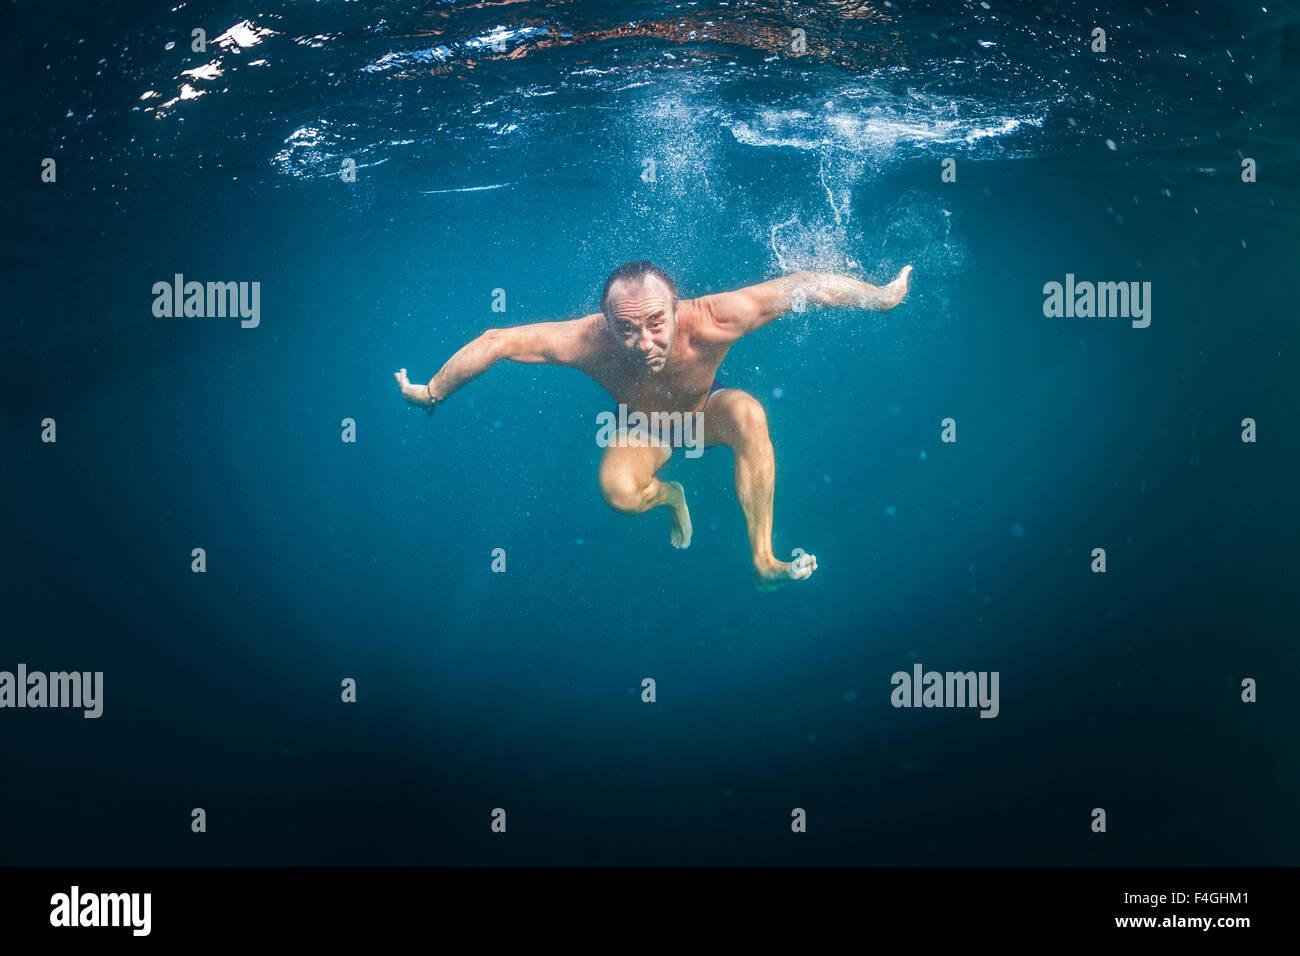 A swimming out at sea. Baignade en haute mer. - Stock Image